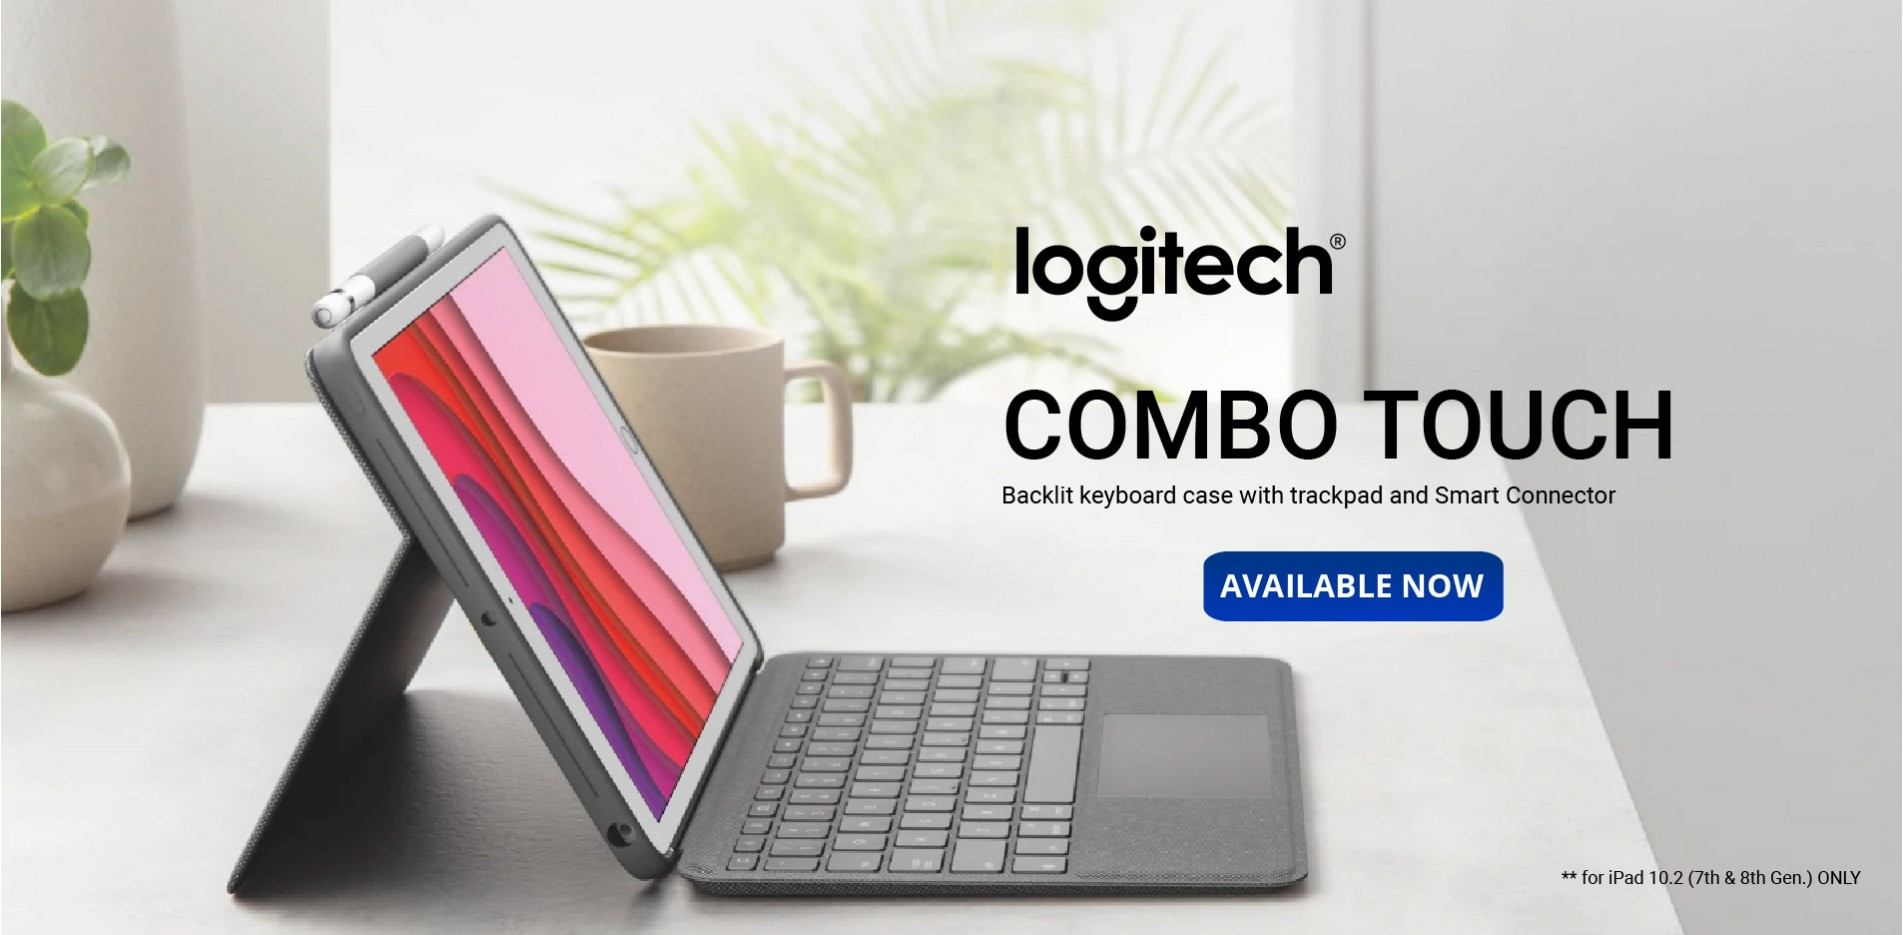 Logitech Combo Touch